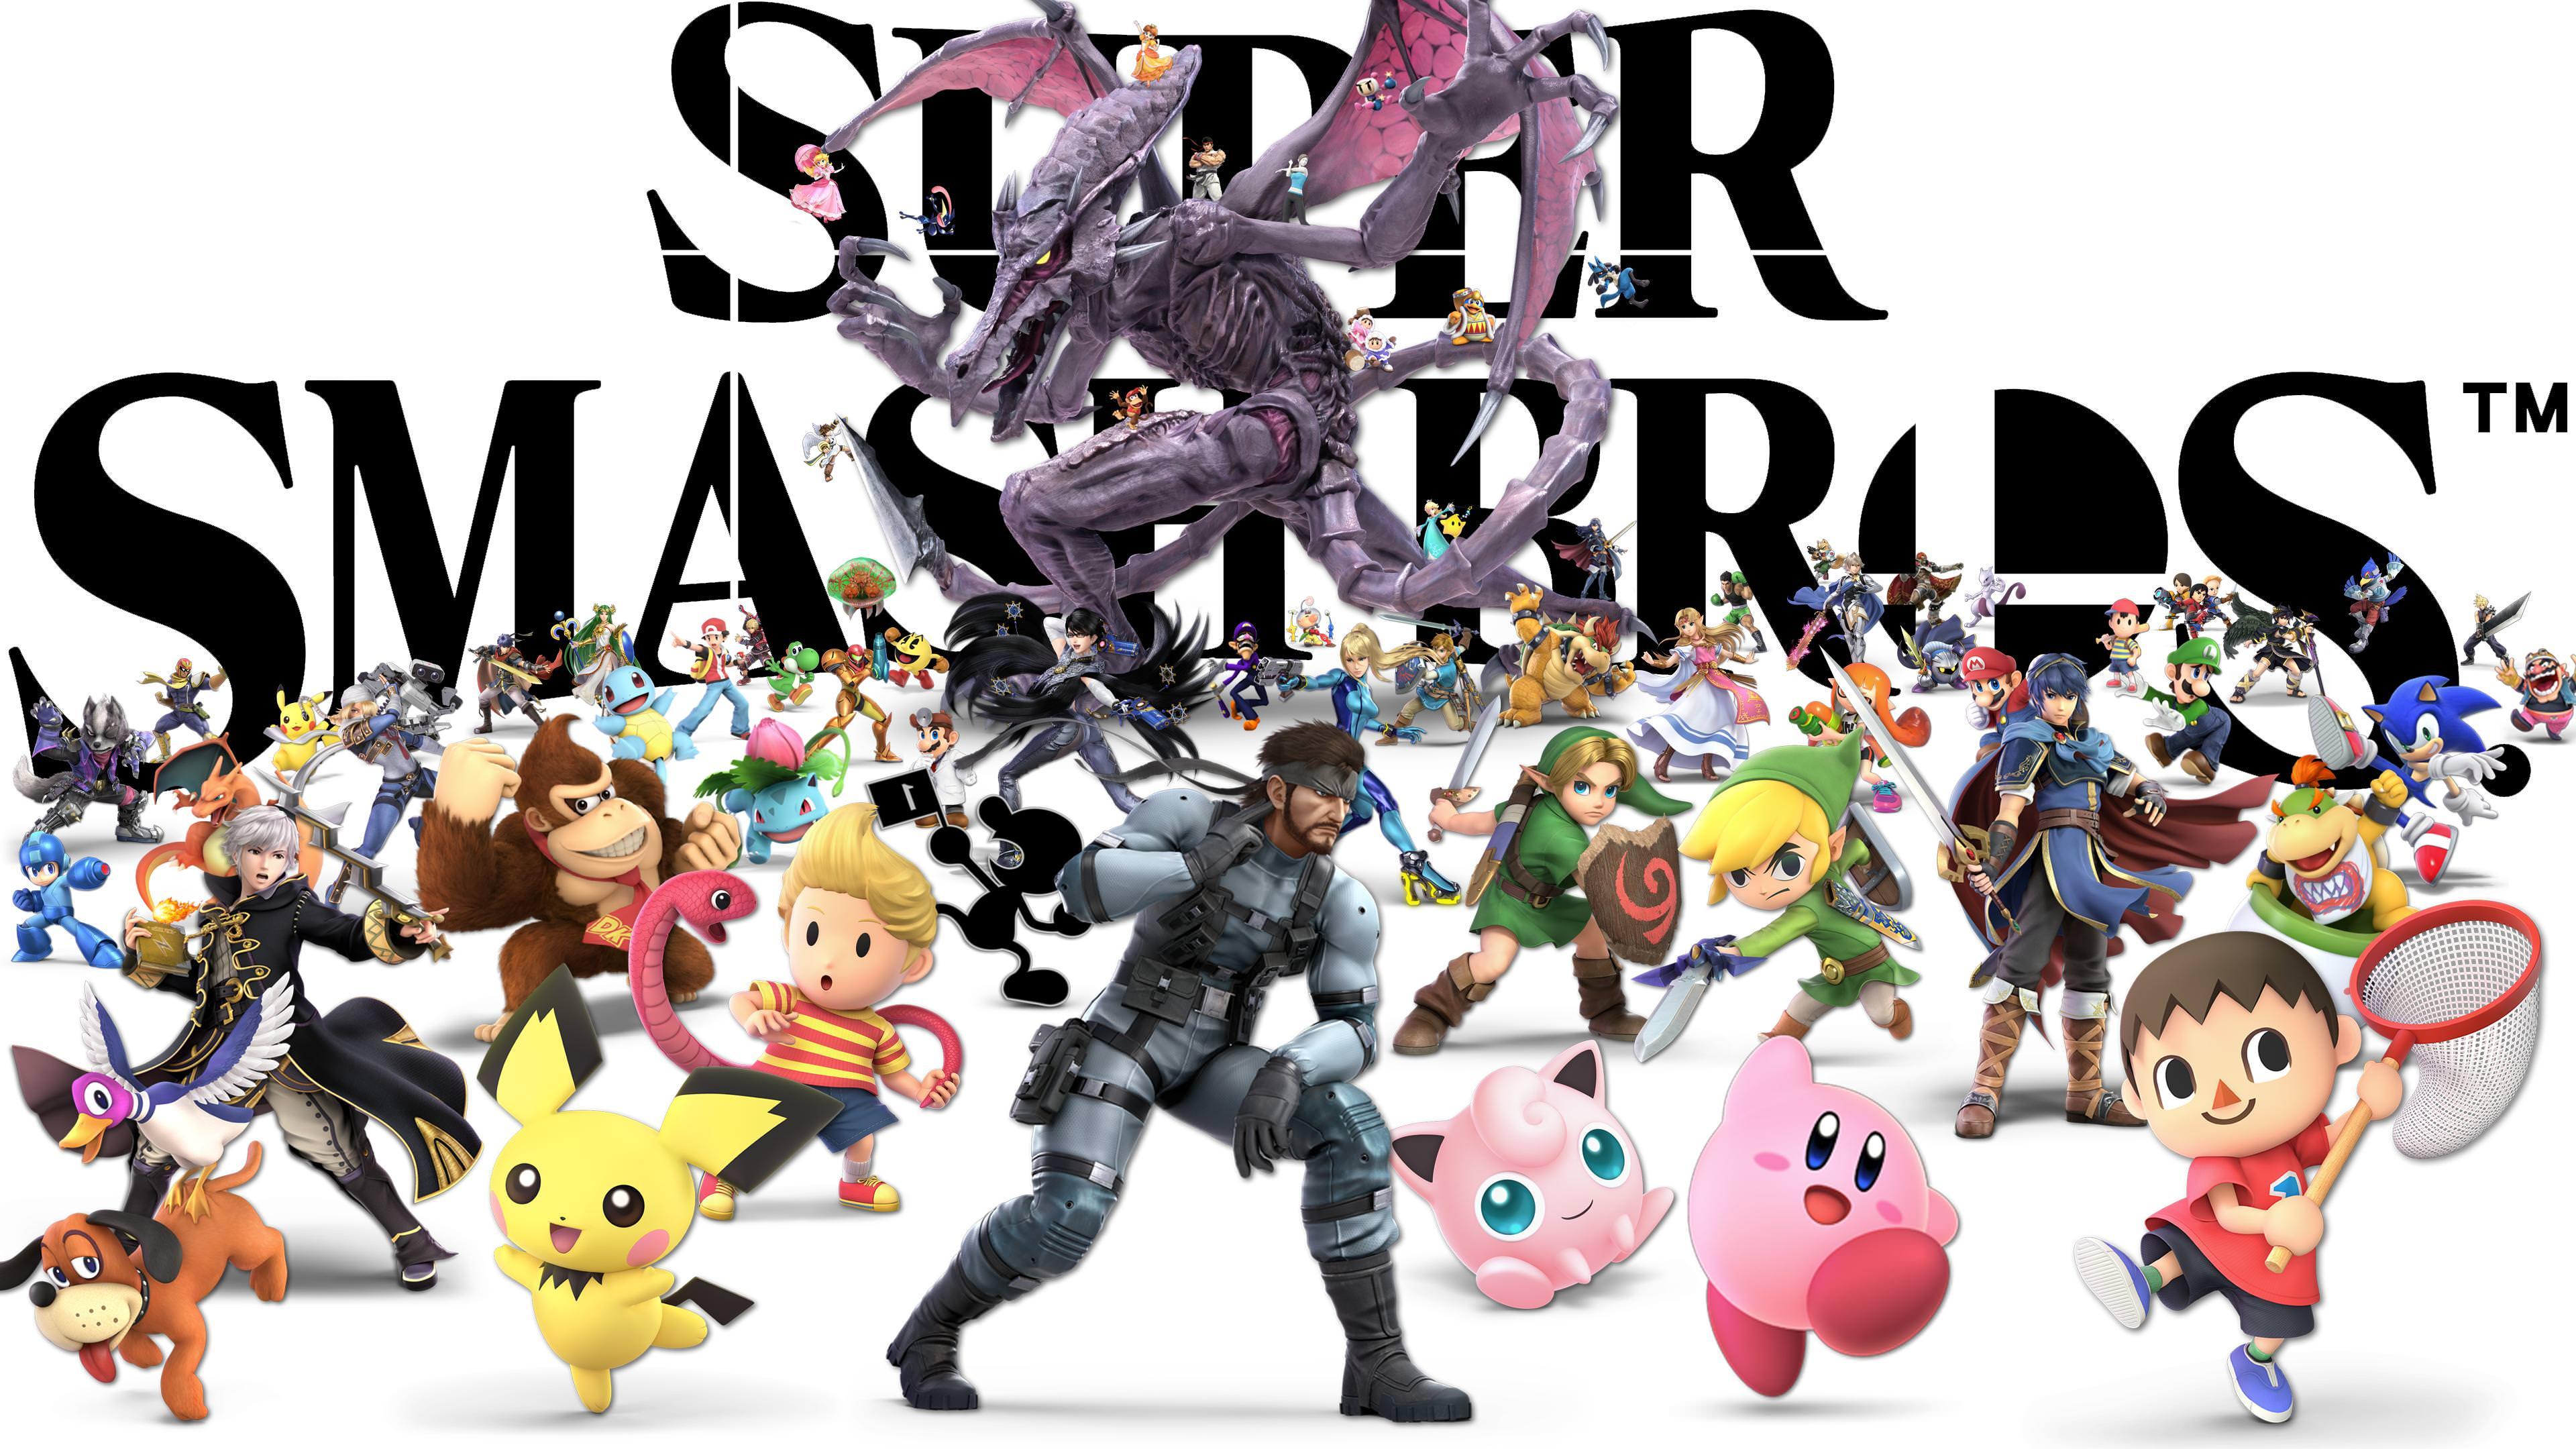 Ultimatei Created A Super Smash Bros Ultimate Wallpaper Smash